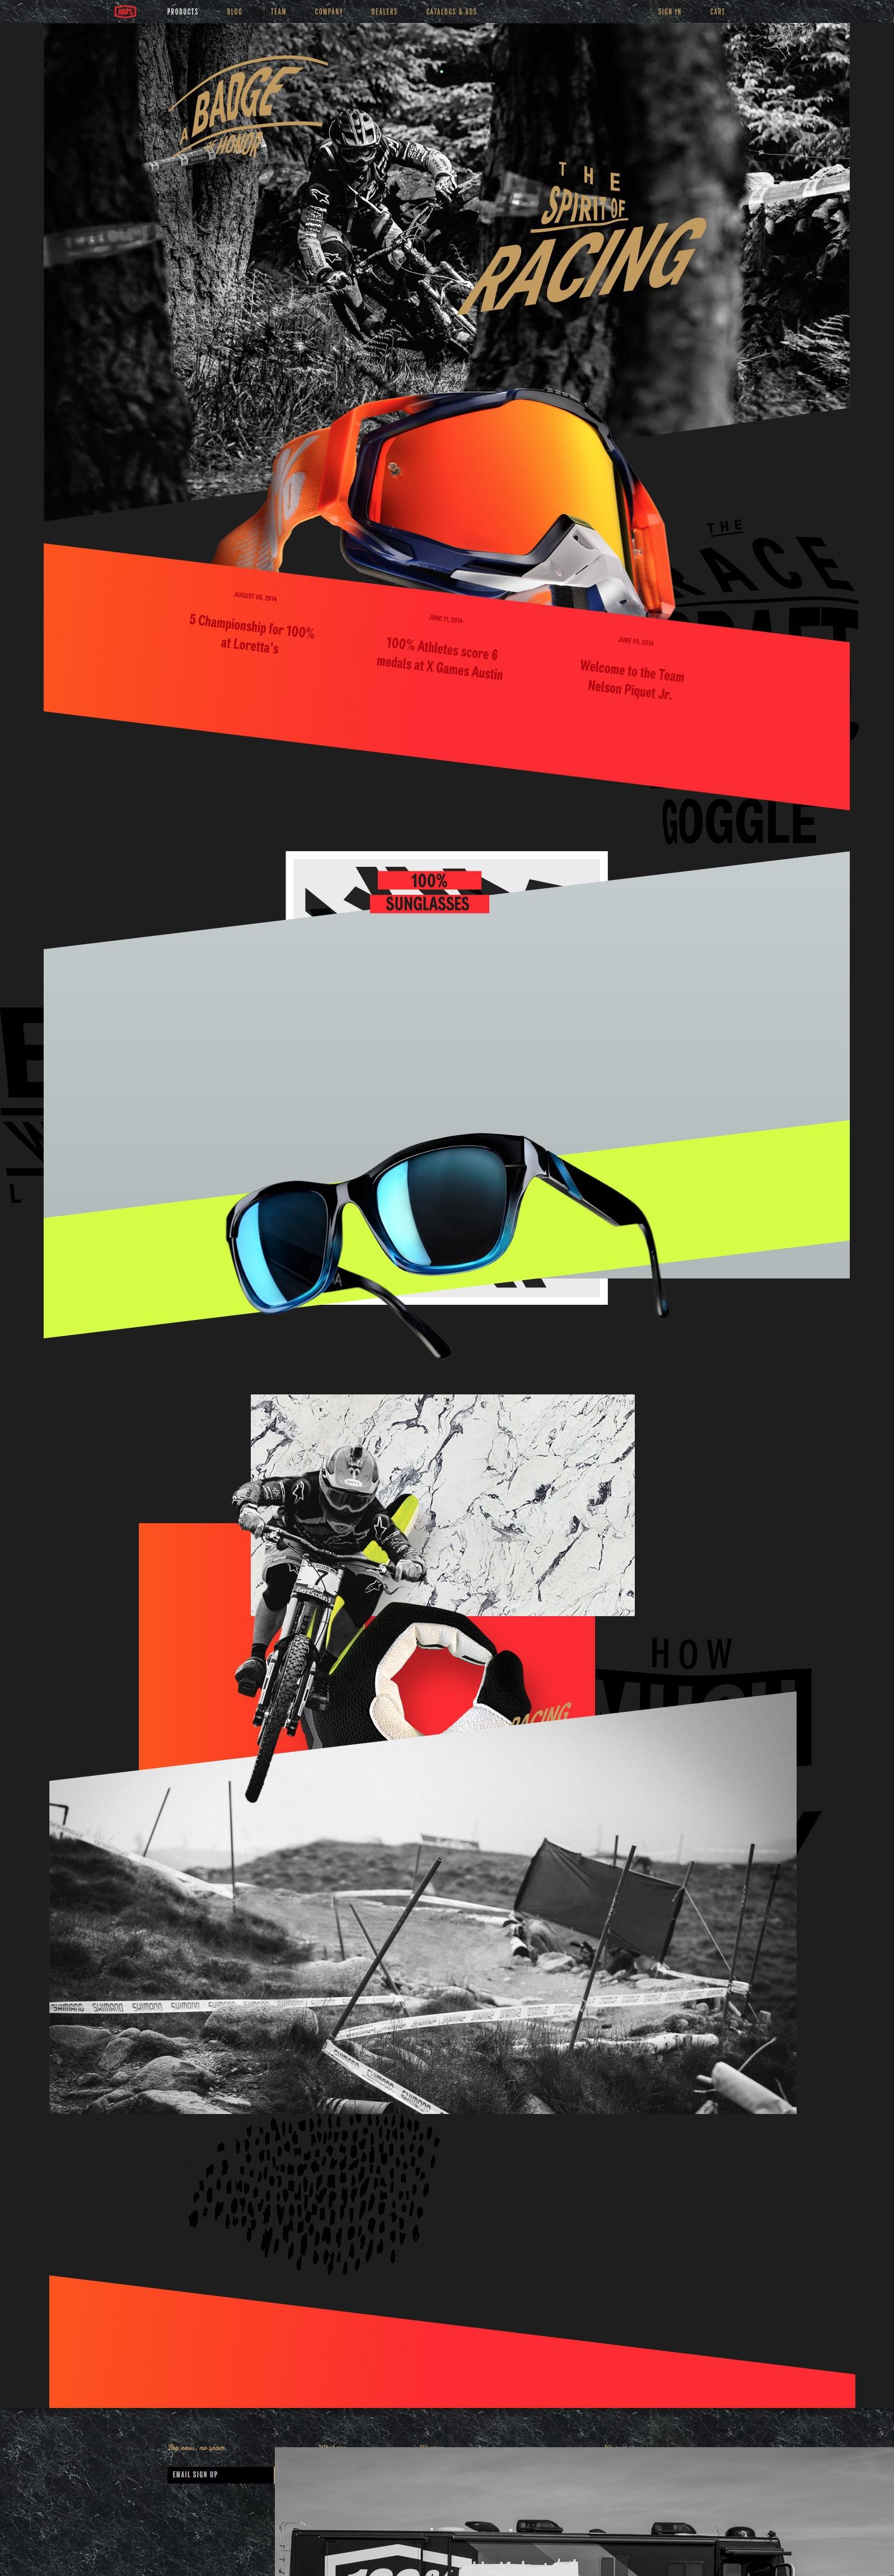 Mountain Bike Ride100Percent